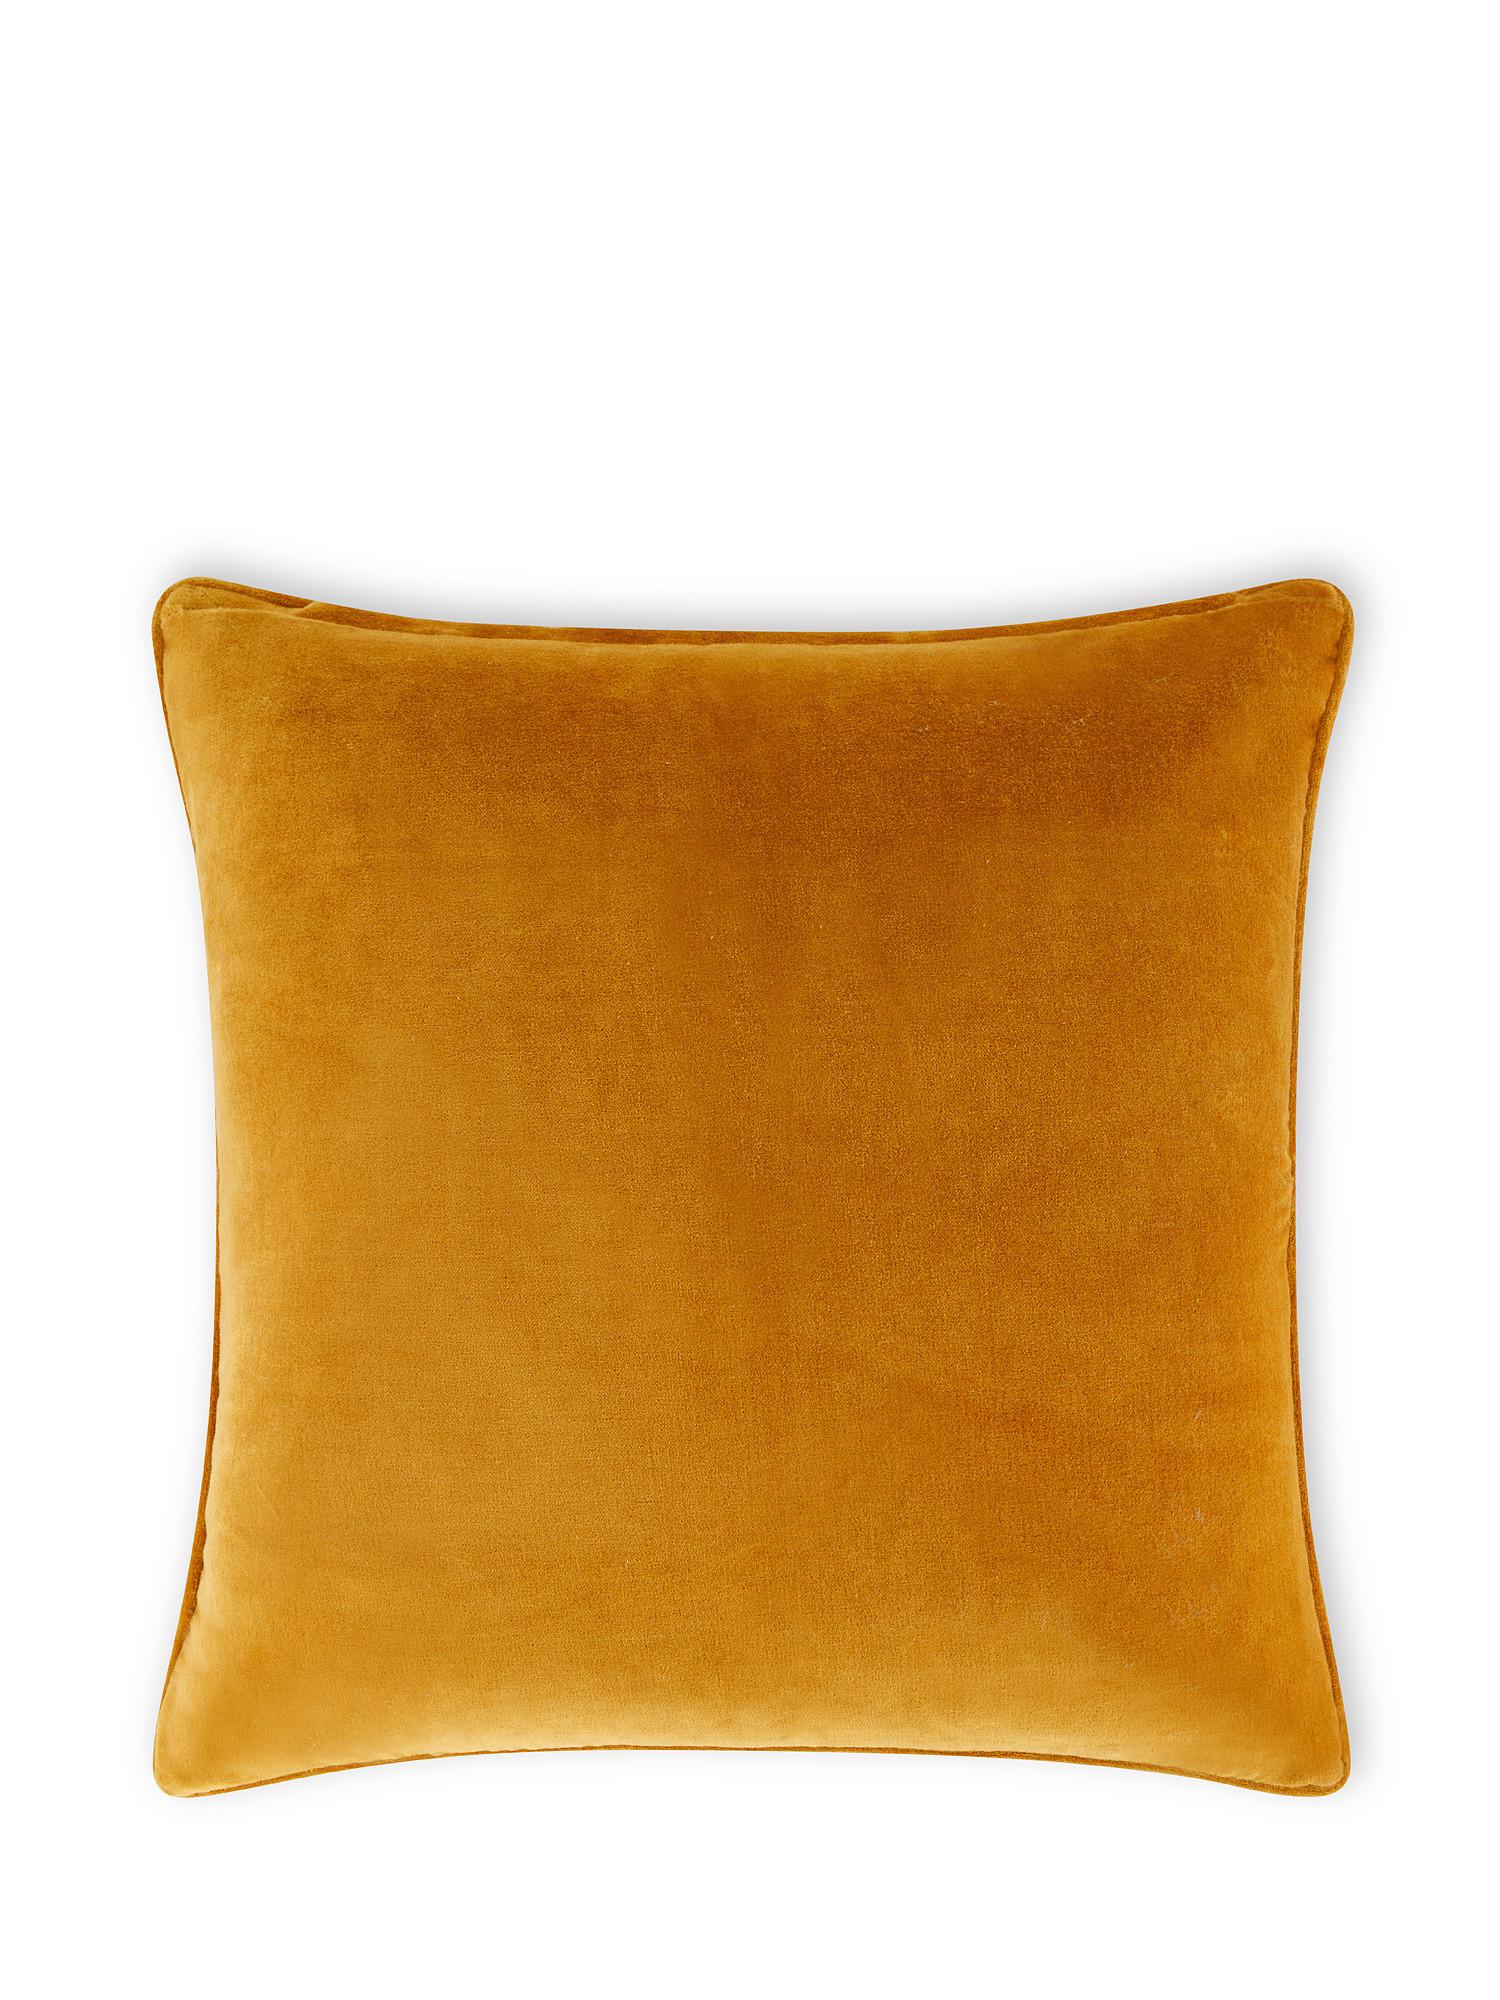 Cuscino velluto di cotone tinta unita 45x45cm, Giallo ocra, large image number 1